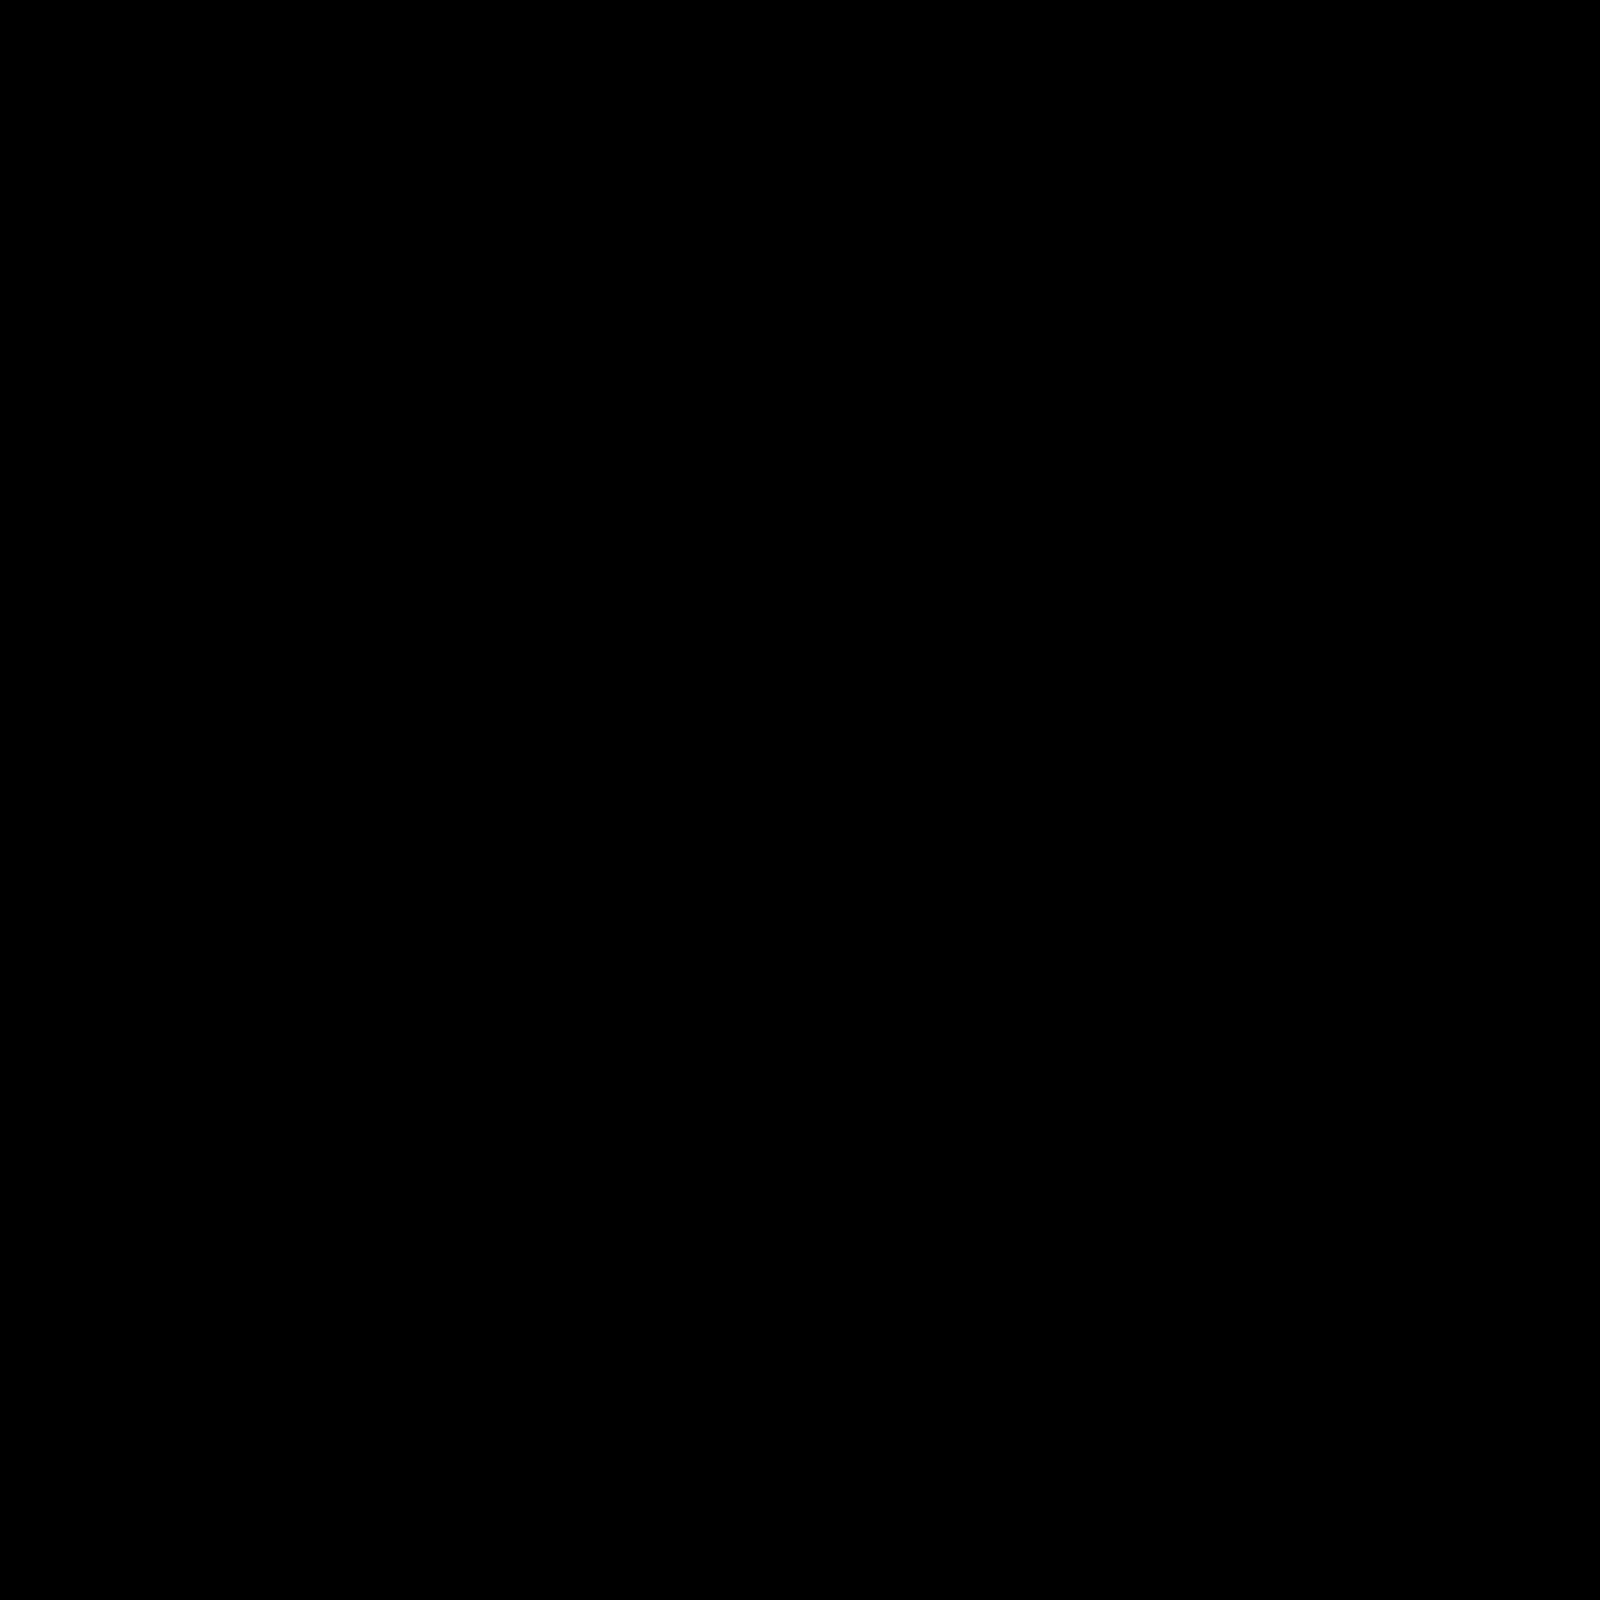 PC Docking Station Filled icon